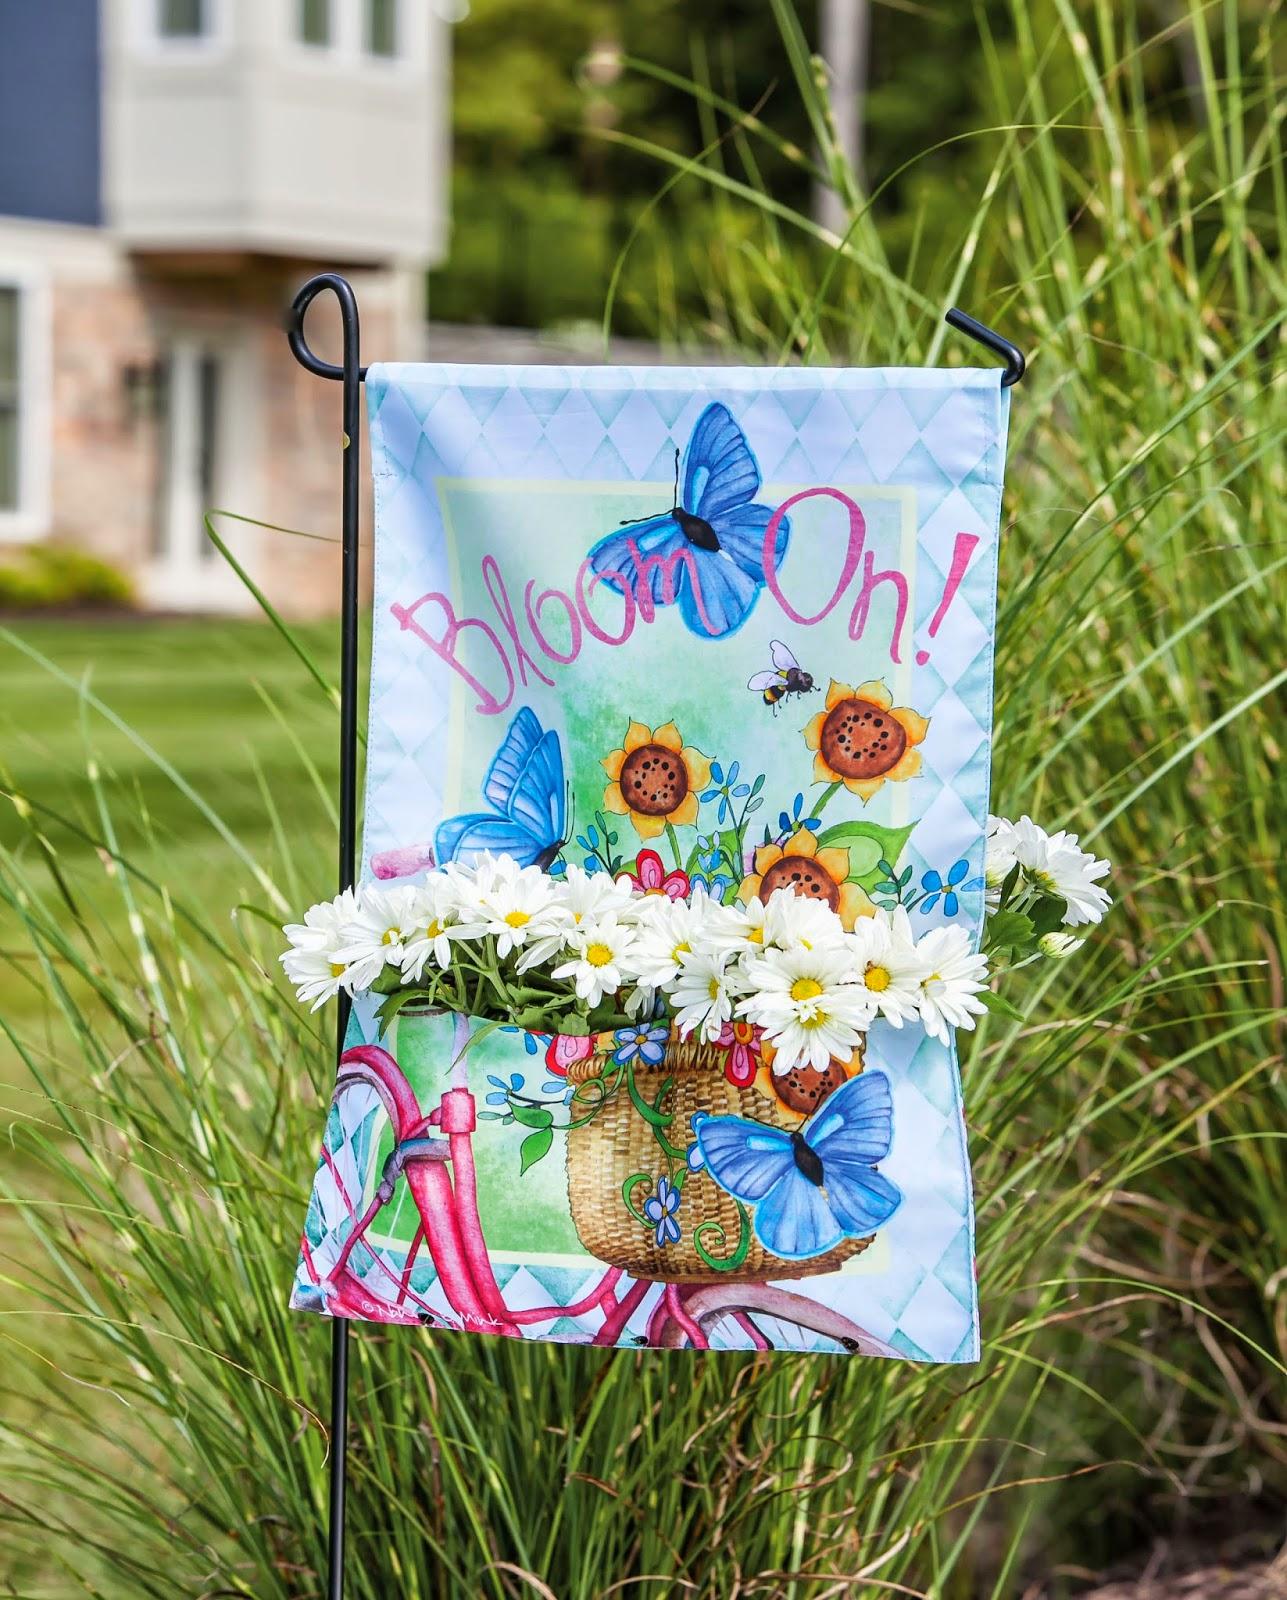 Evergreen Enterprises: Bringing Flags to Life: Introducing Bloom ...